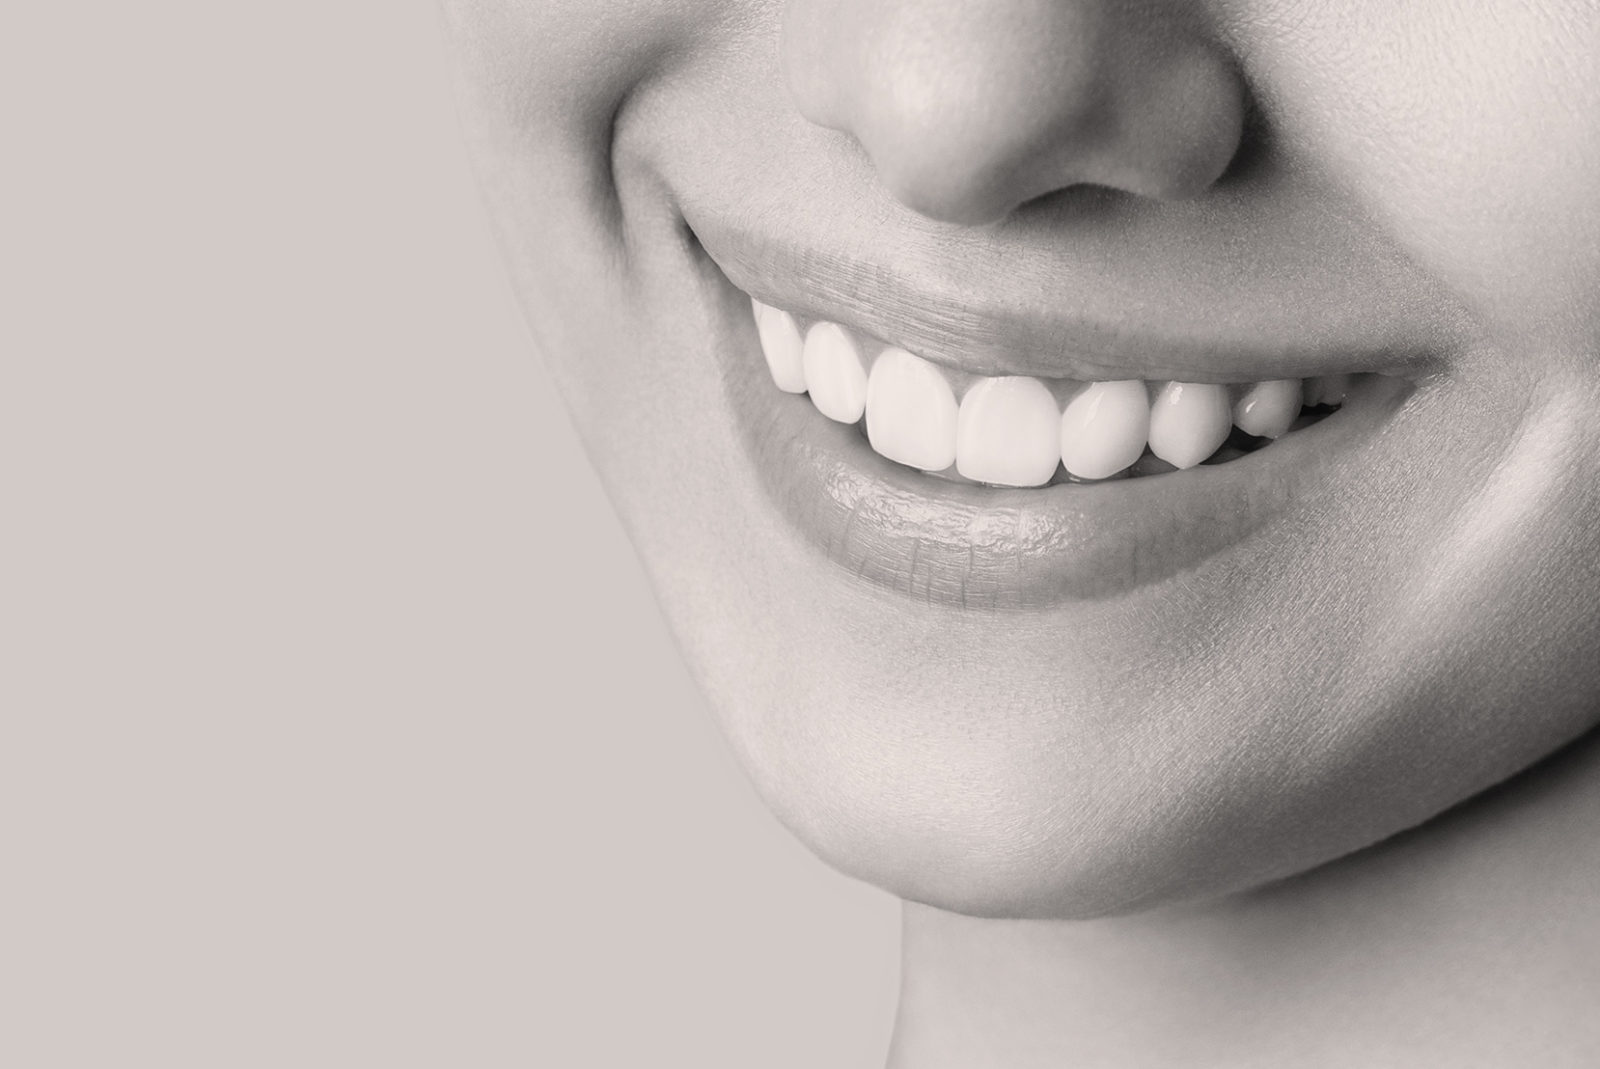 Blanchiment dentaire à Lyon - Dr Serge Sobol : Chirurgien-dentiste